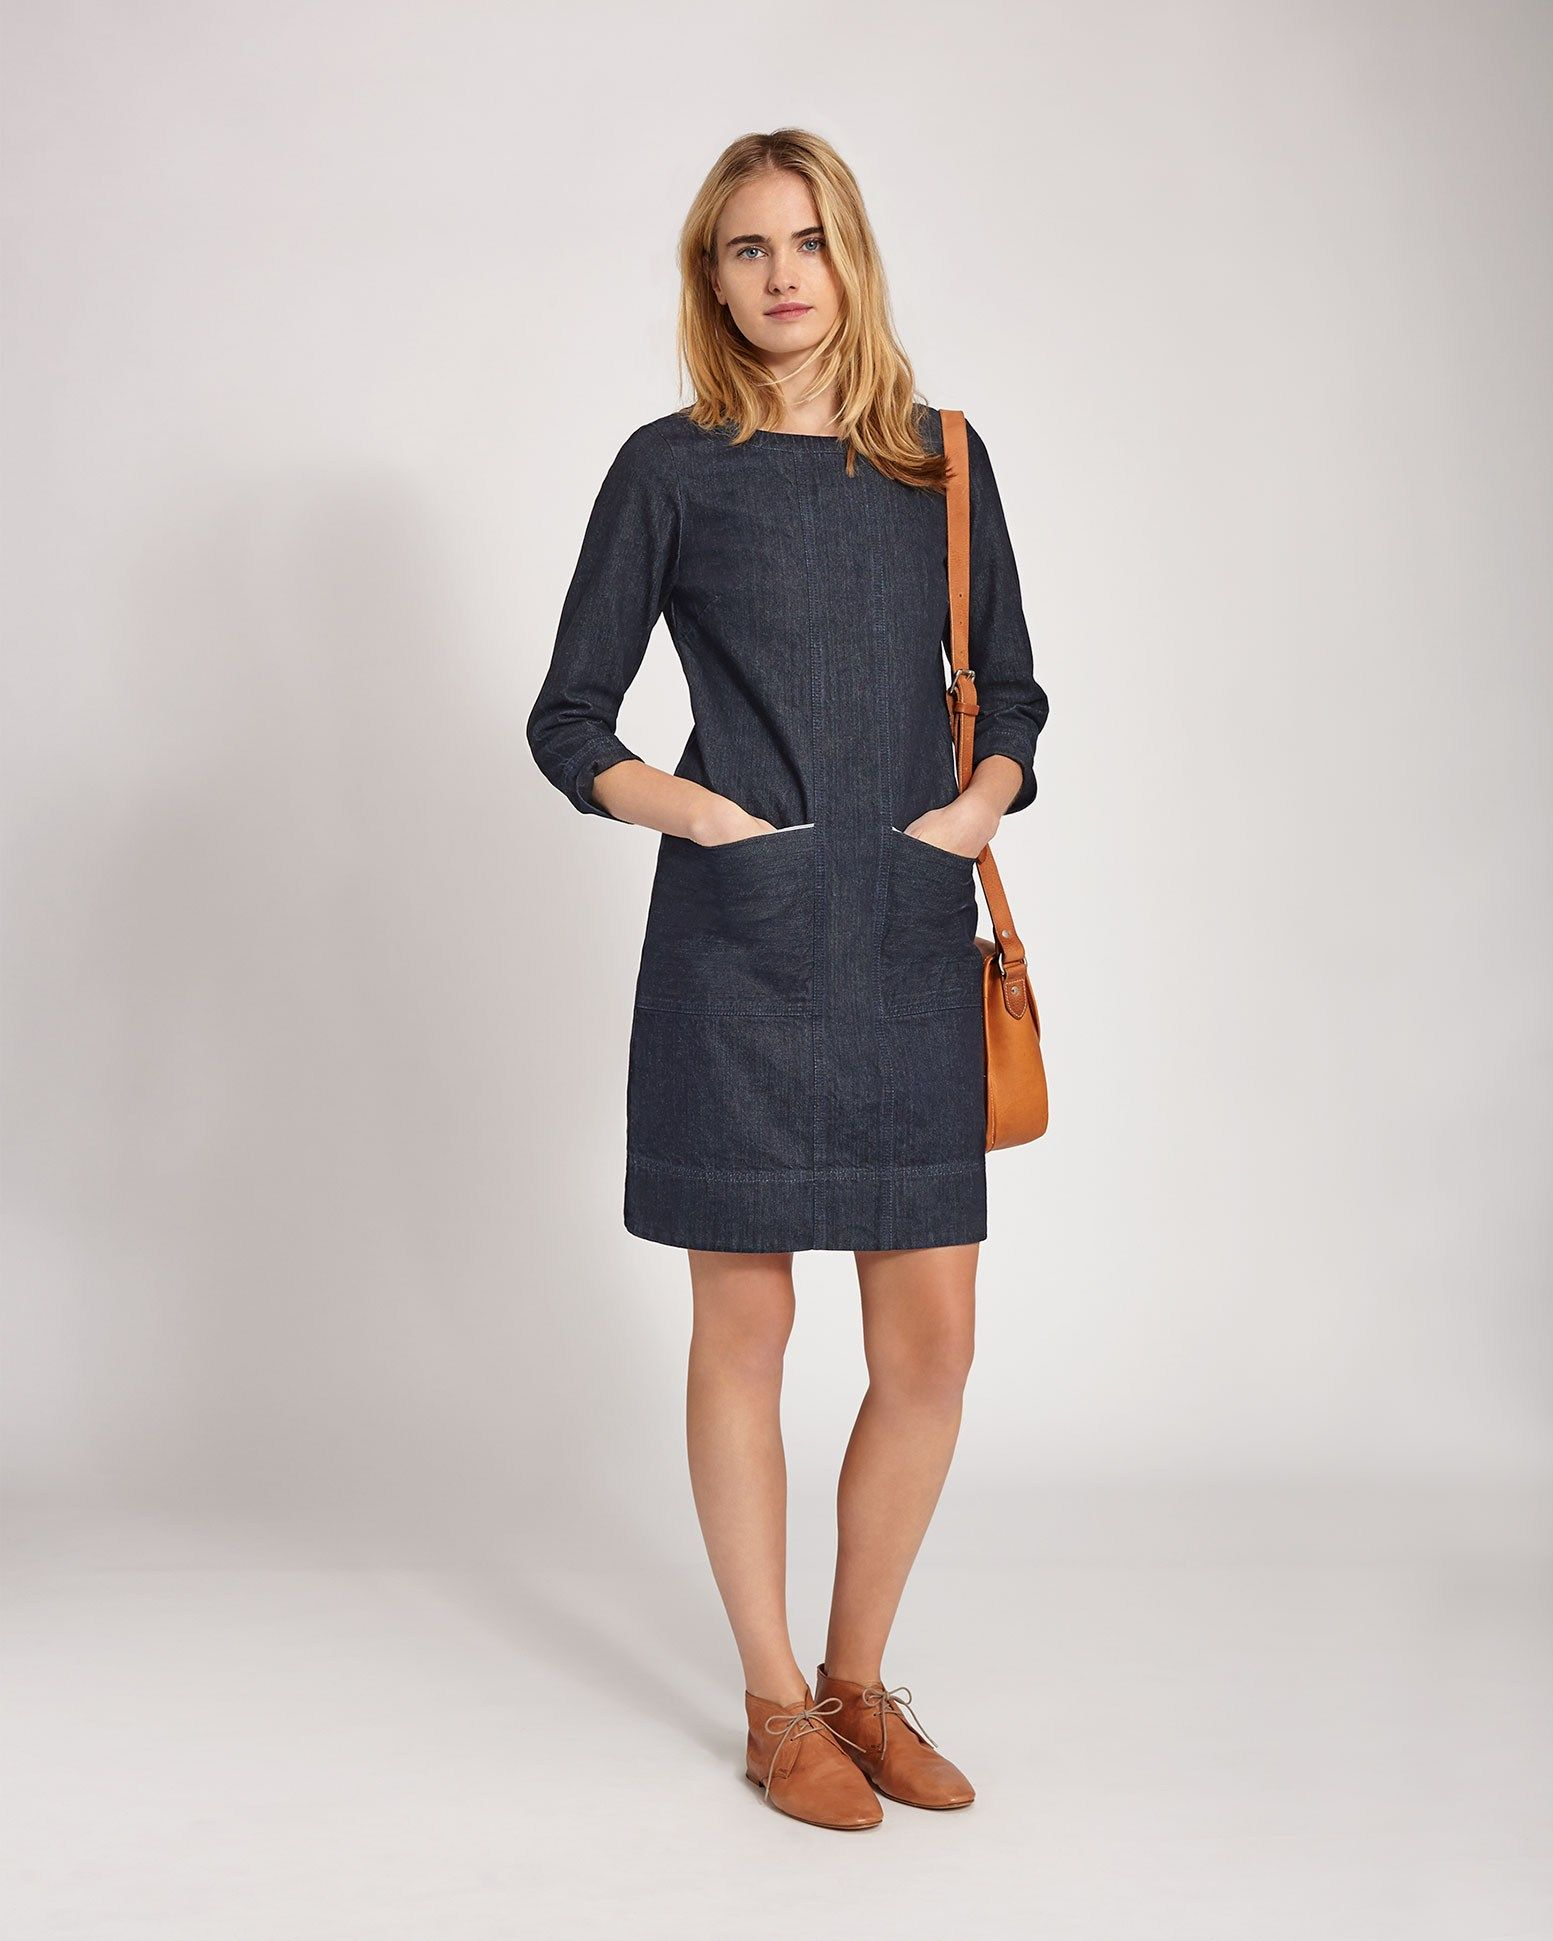 Womenus Hiro Denim Dress in Denim  TOAST  DENIM  Pinterest